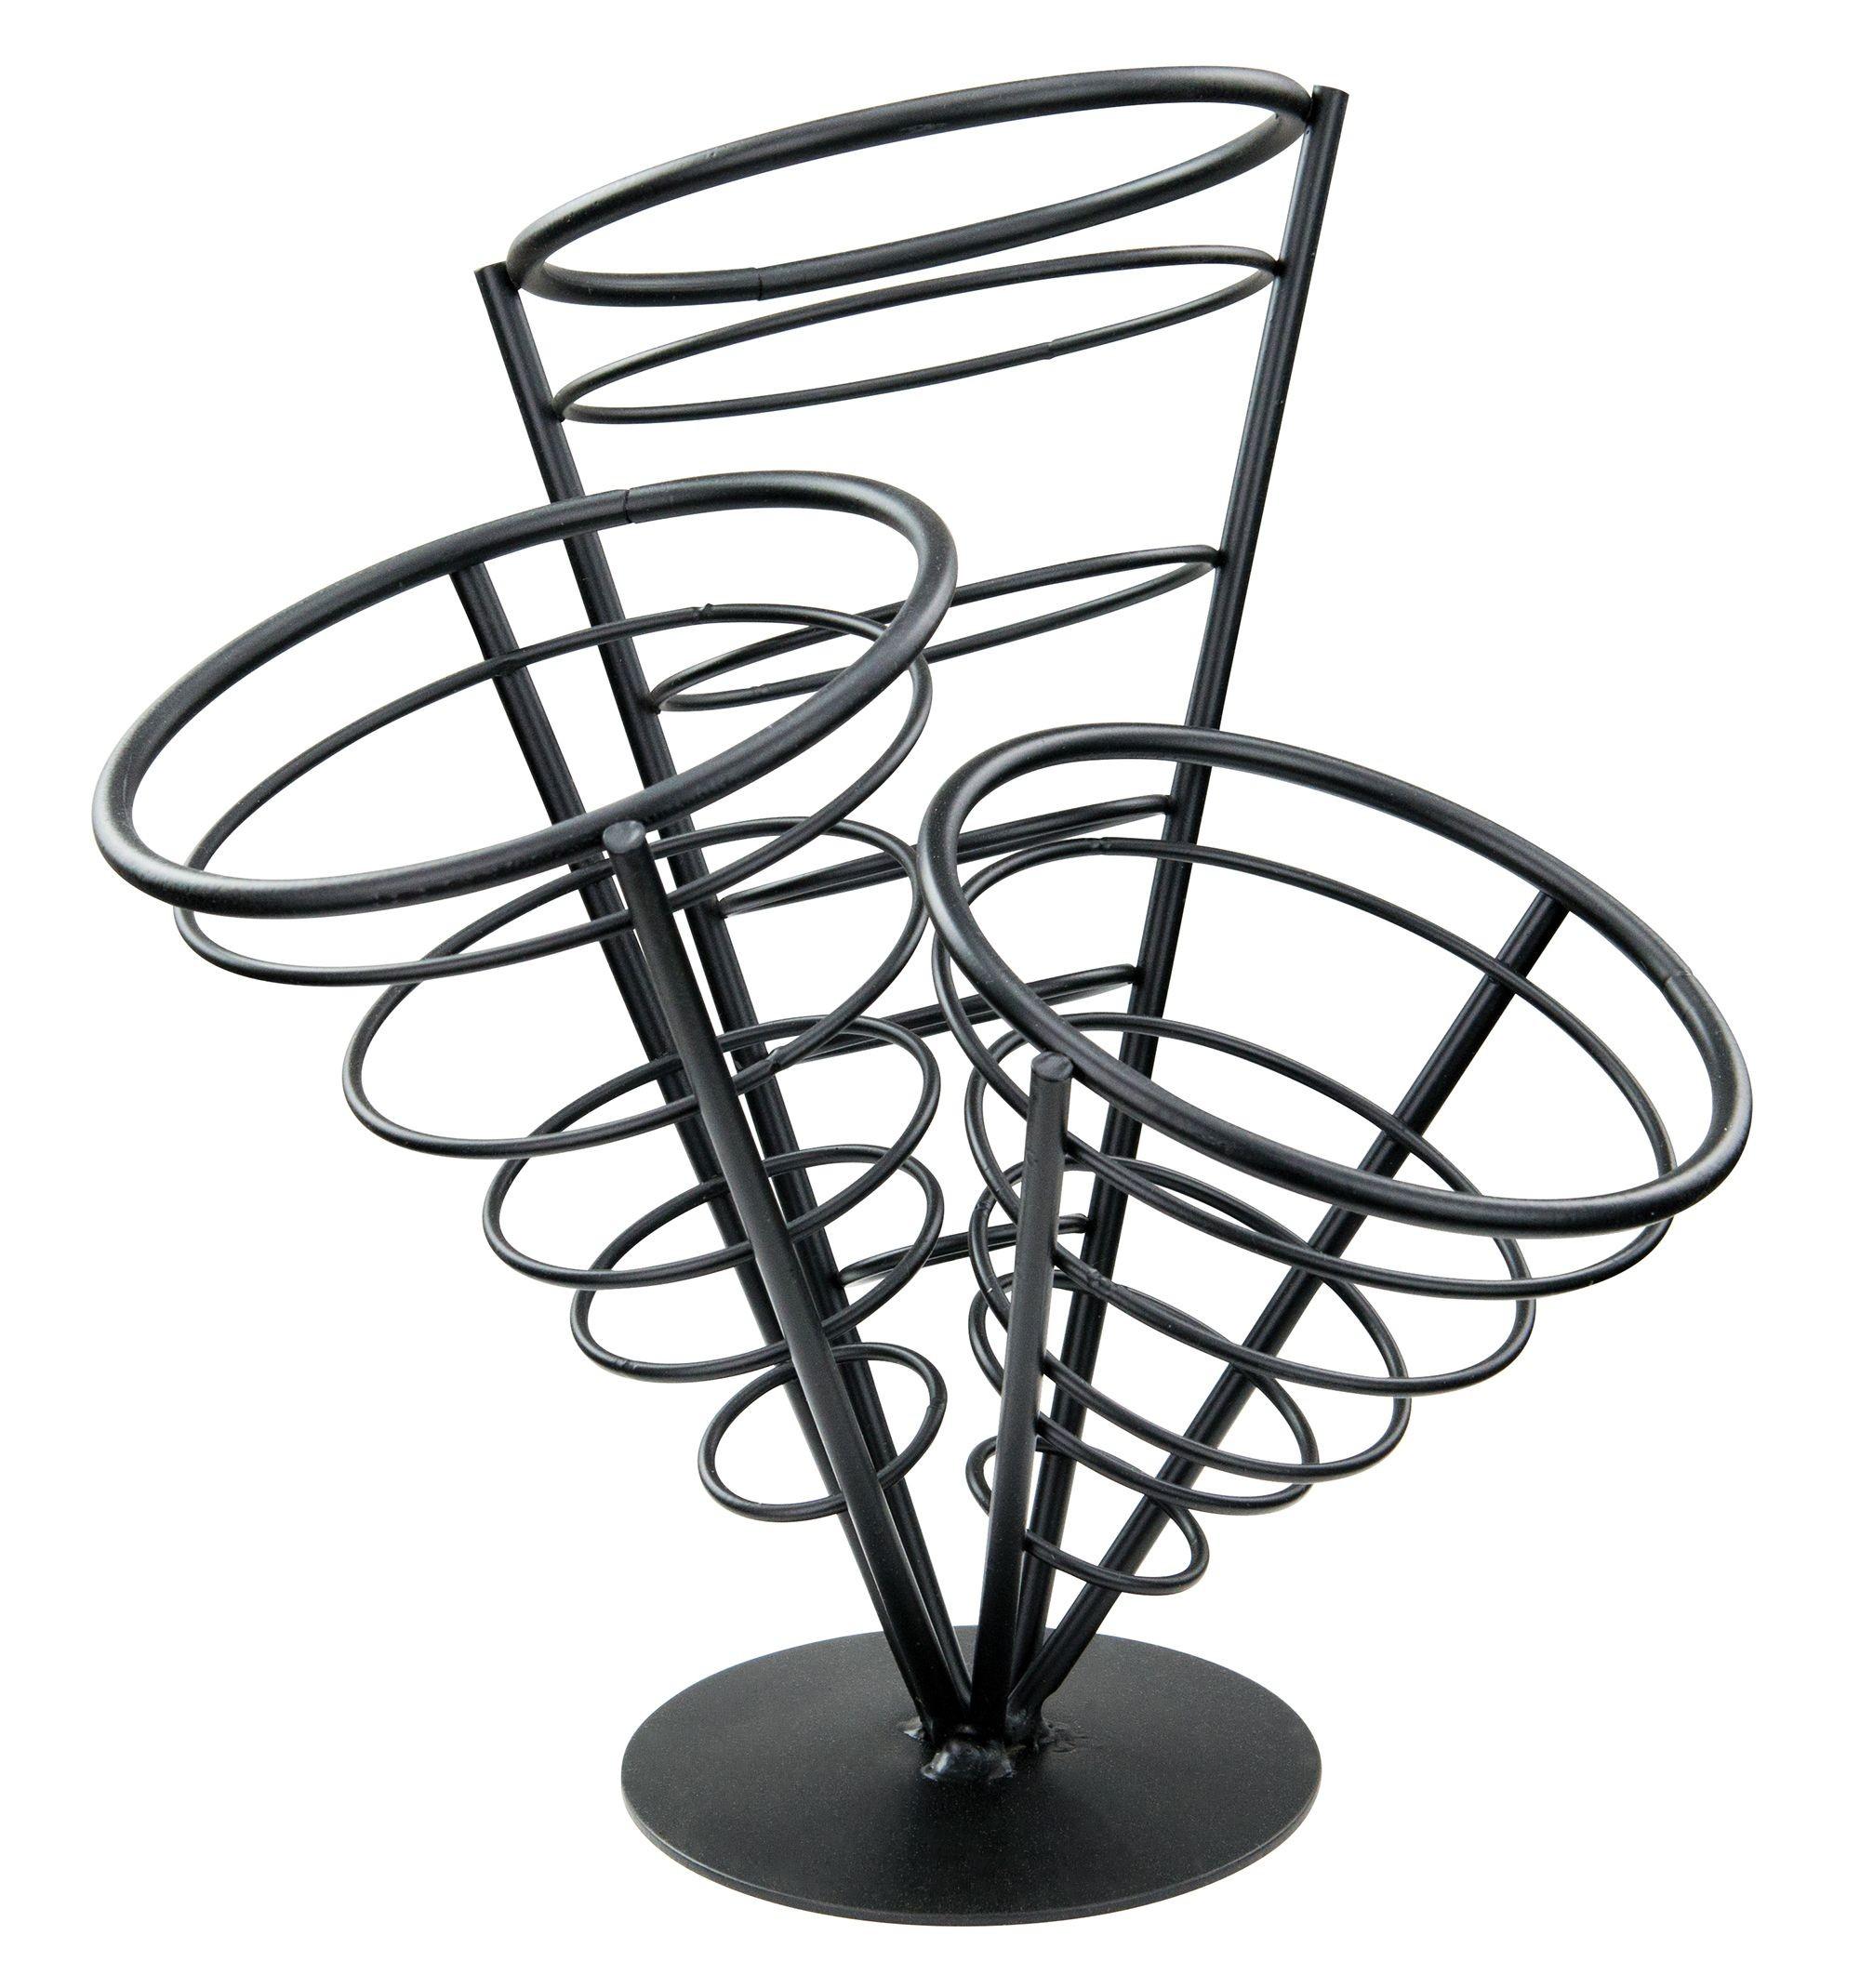 Winco WBKH-10 3-Cone Black Wire French Fry Holder